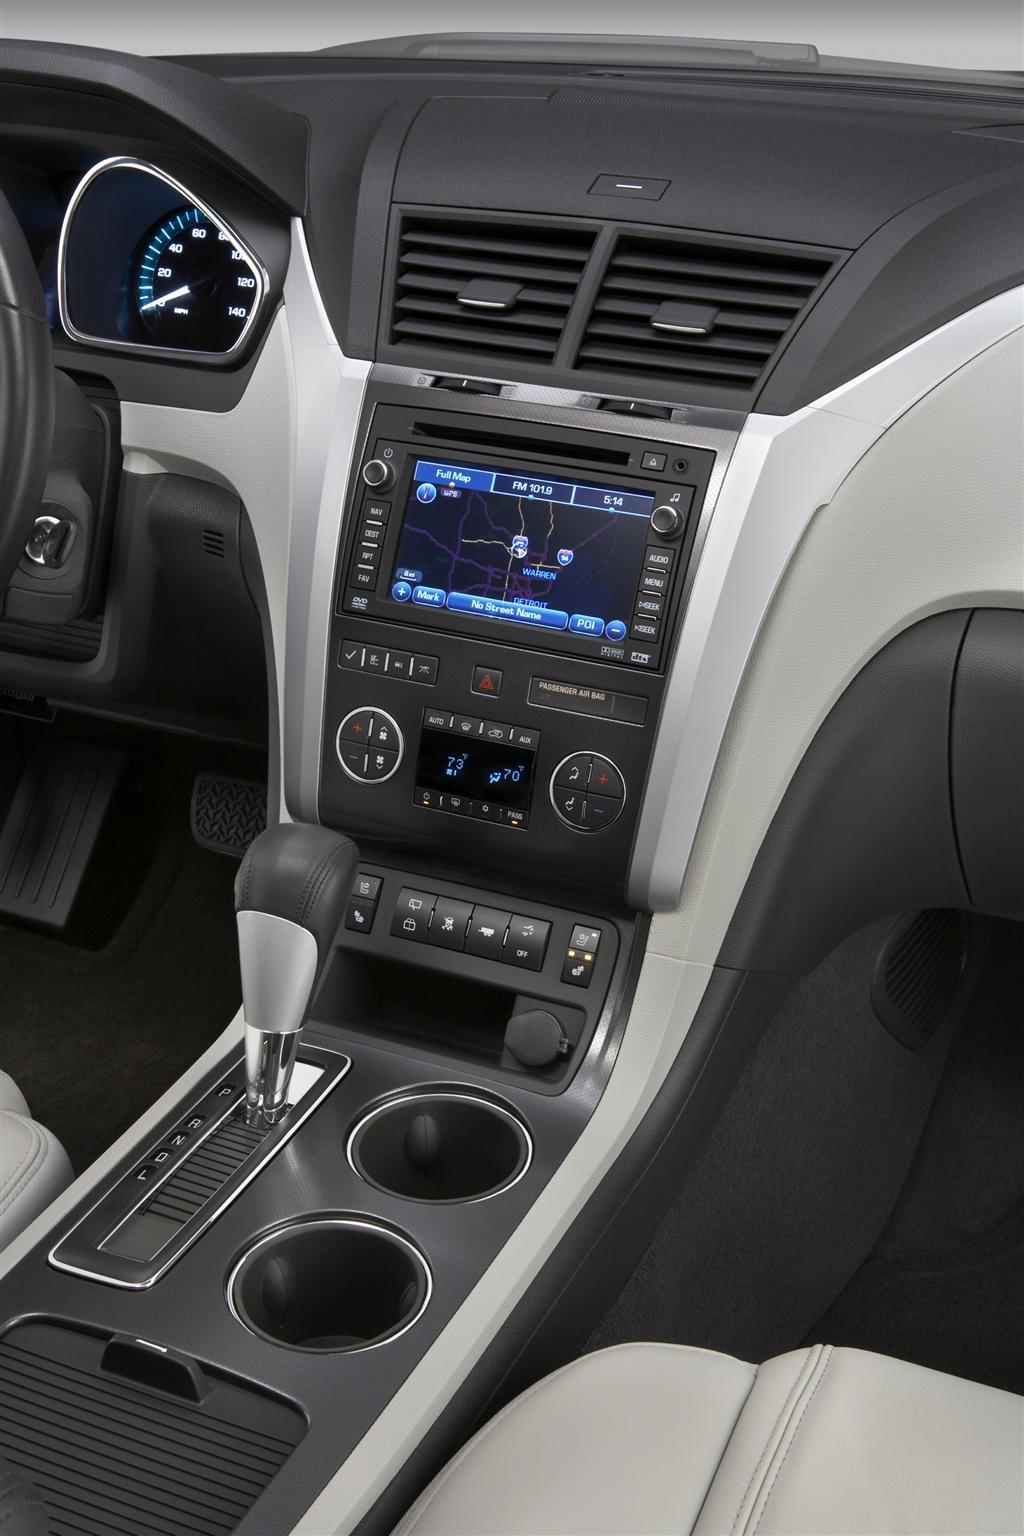 All Chevy chevy 2008 : 2008 Chevrolet Traverse - conceptcarz.com